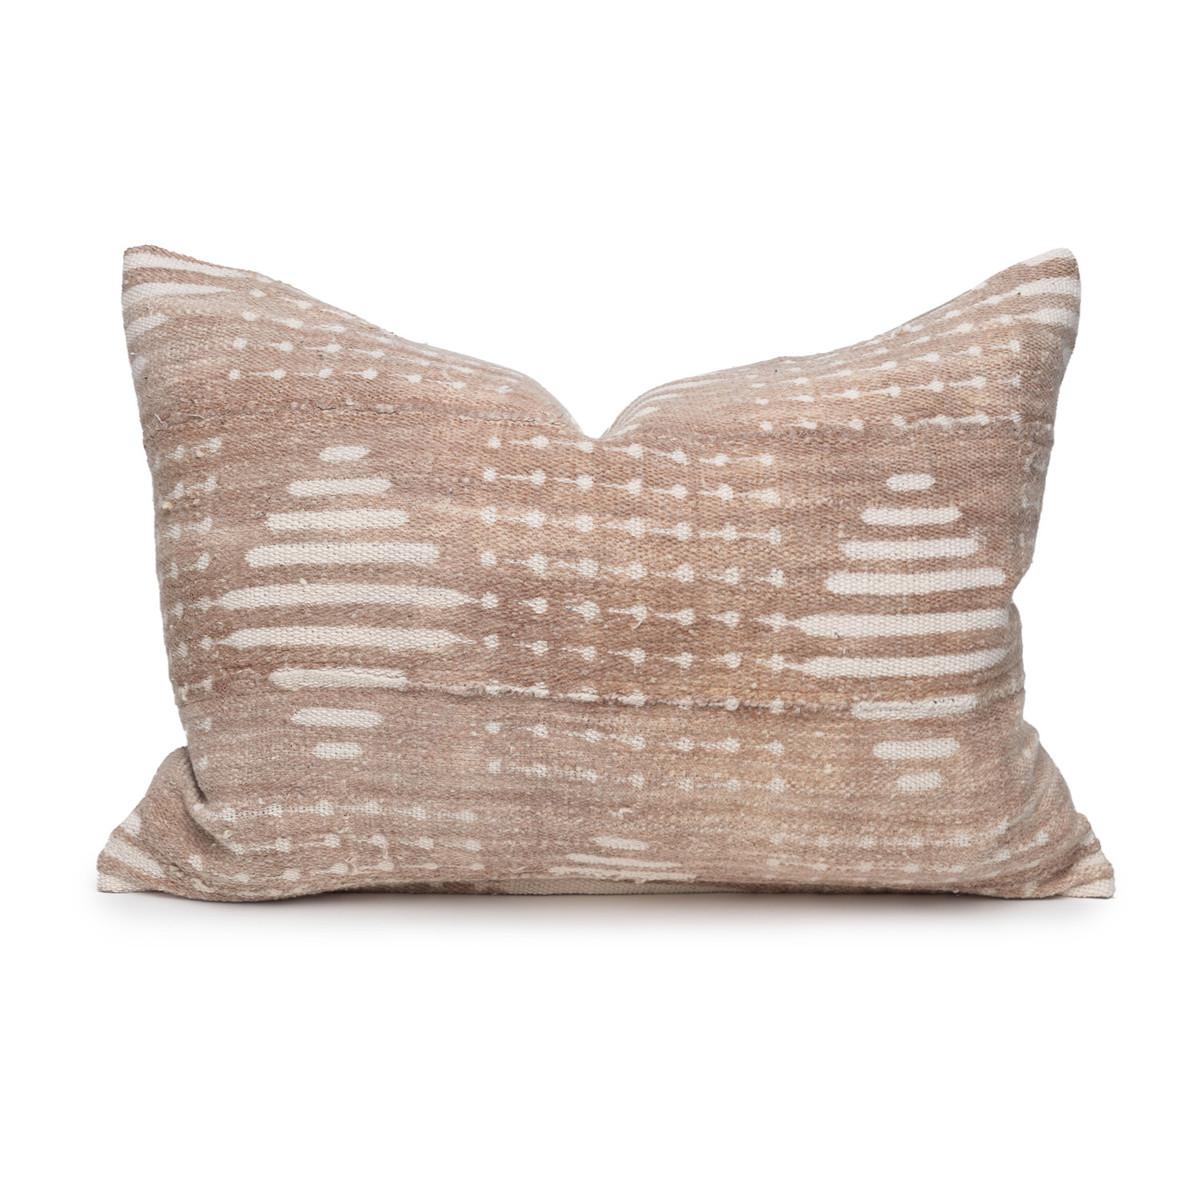 Ridge Lumbar Mud Cloth Pillow in Taupe - 1622 -  Front View